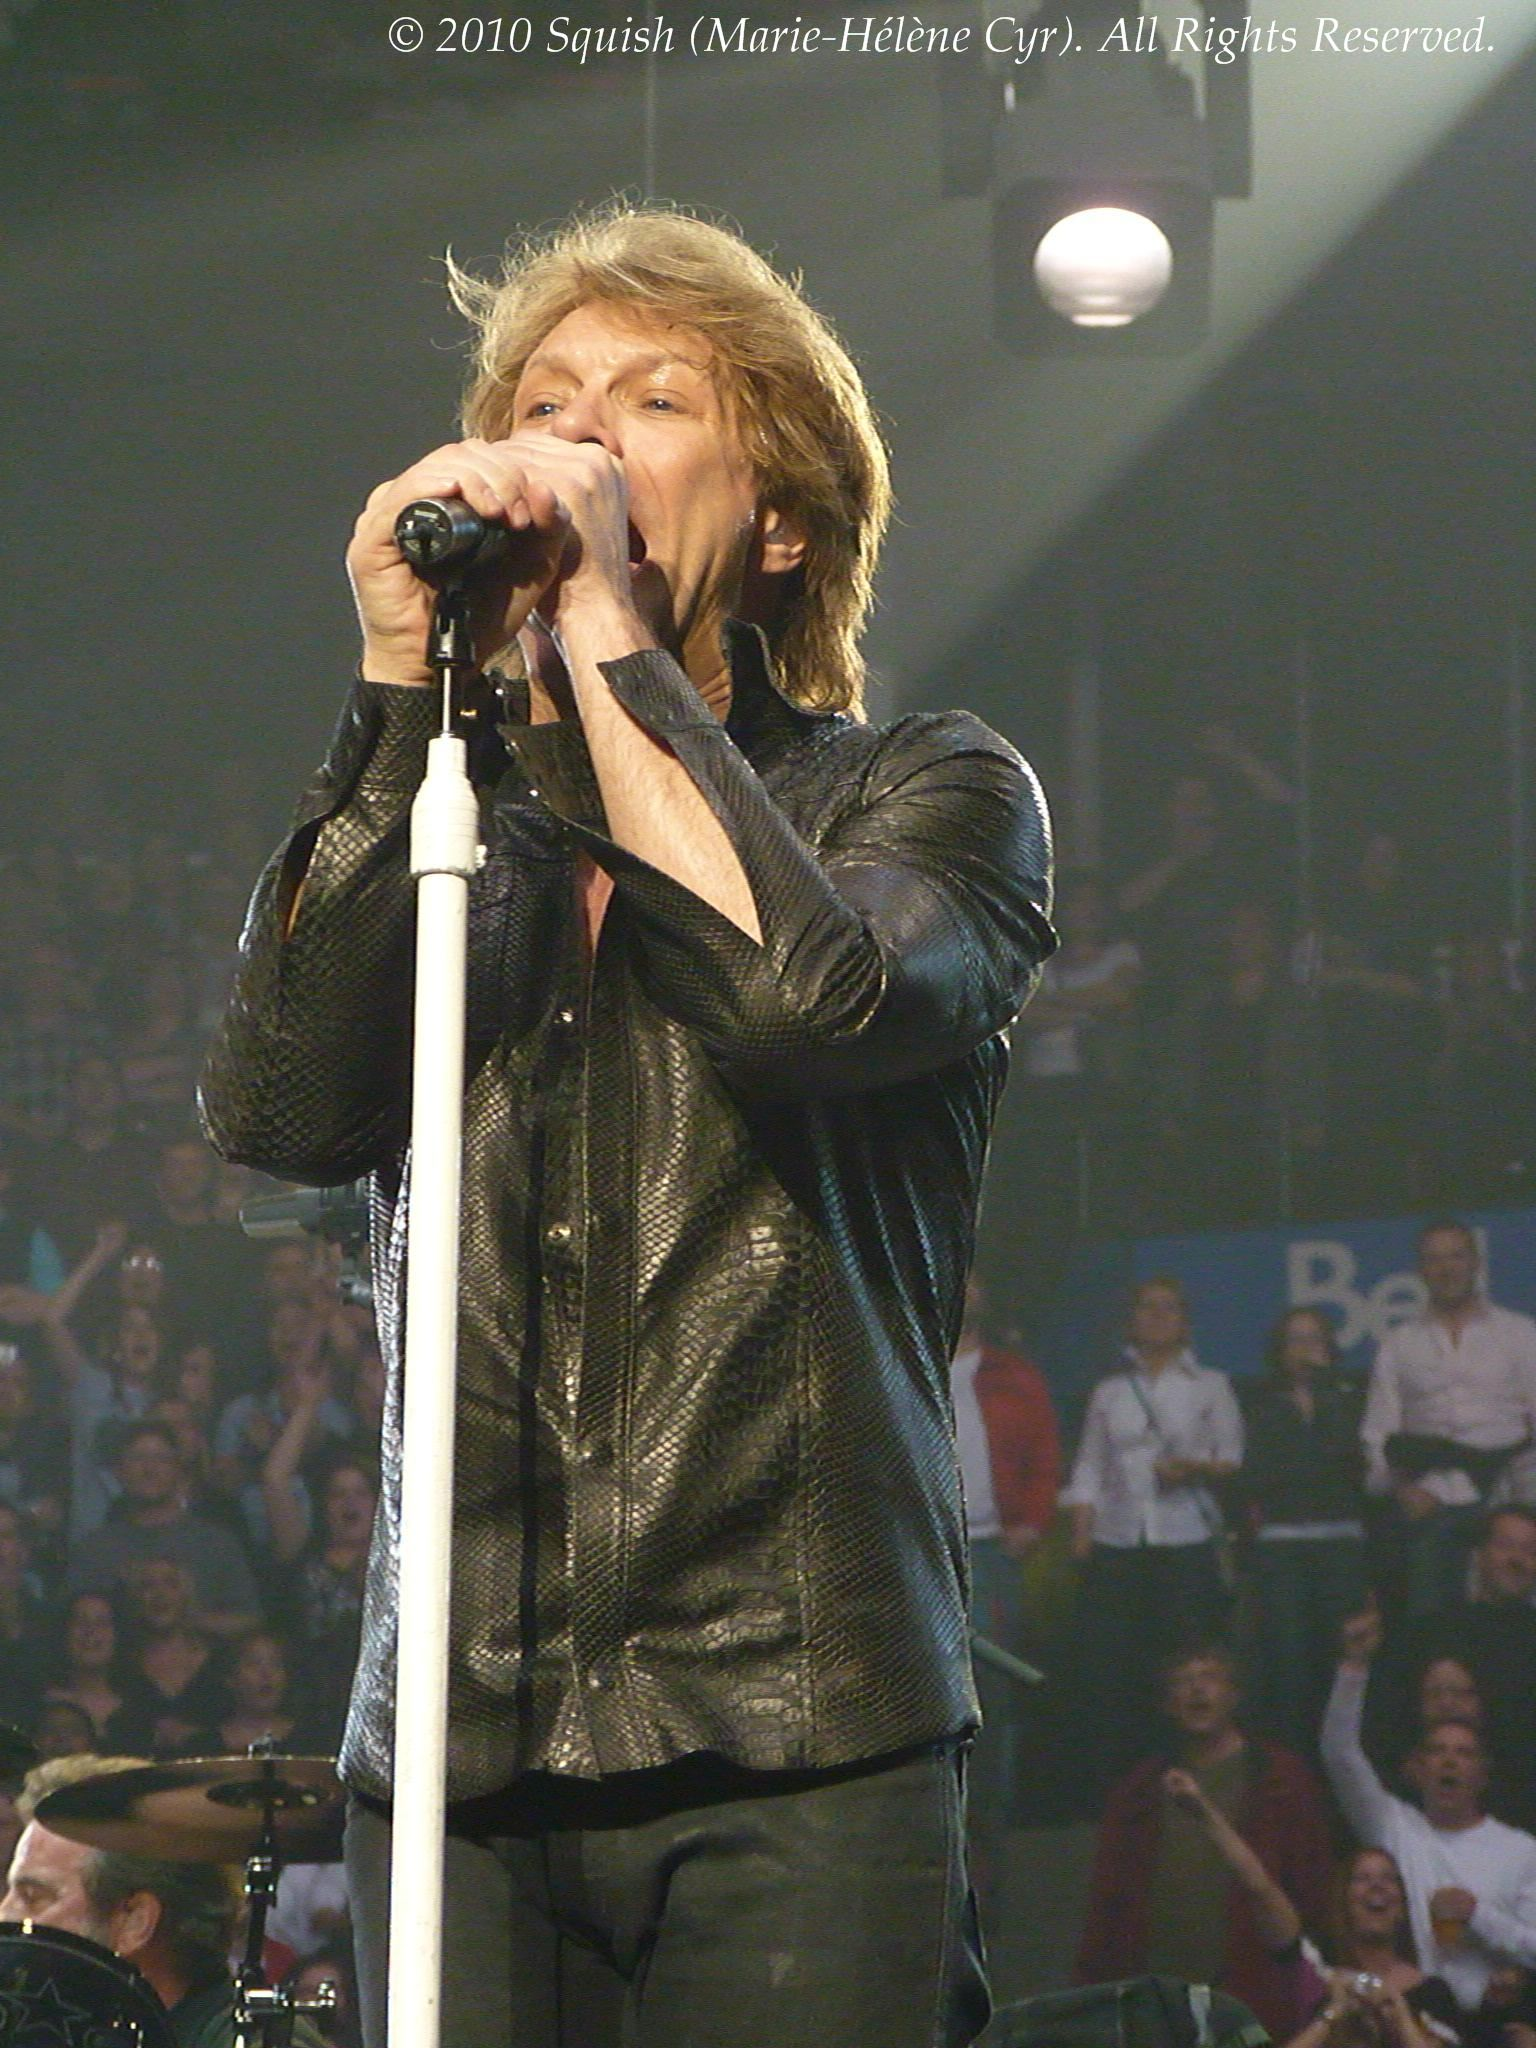 Bon Jovi - Bell Centre, Quebec, Canada (March 20, 2010)